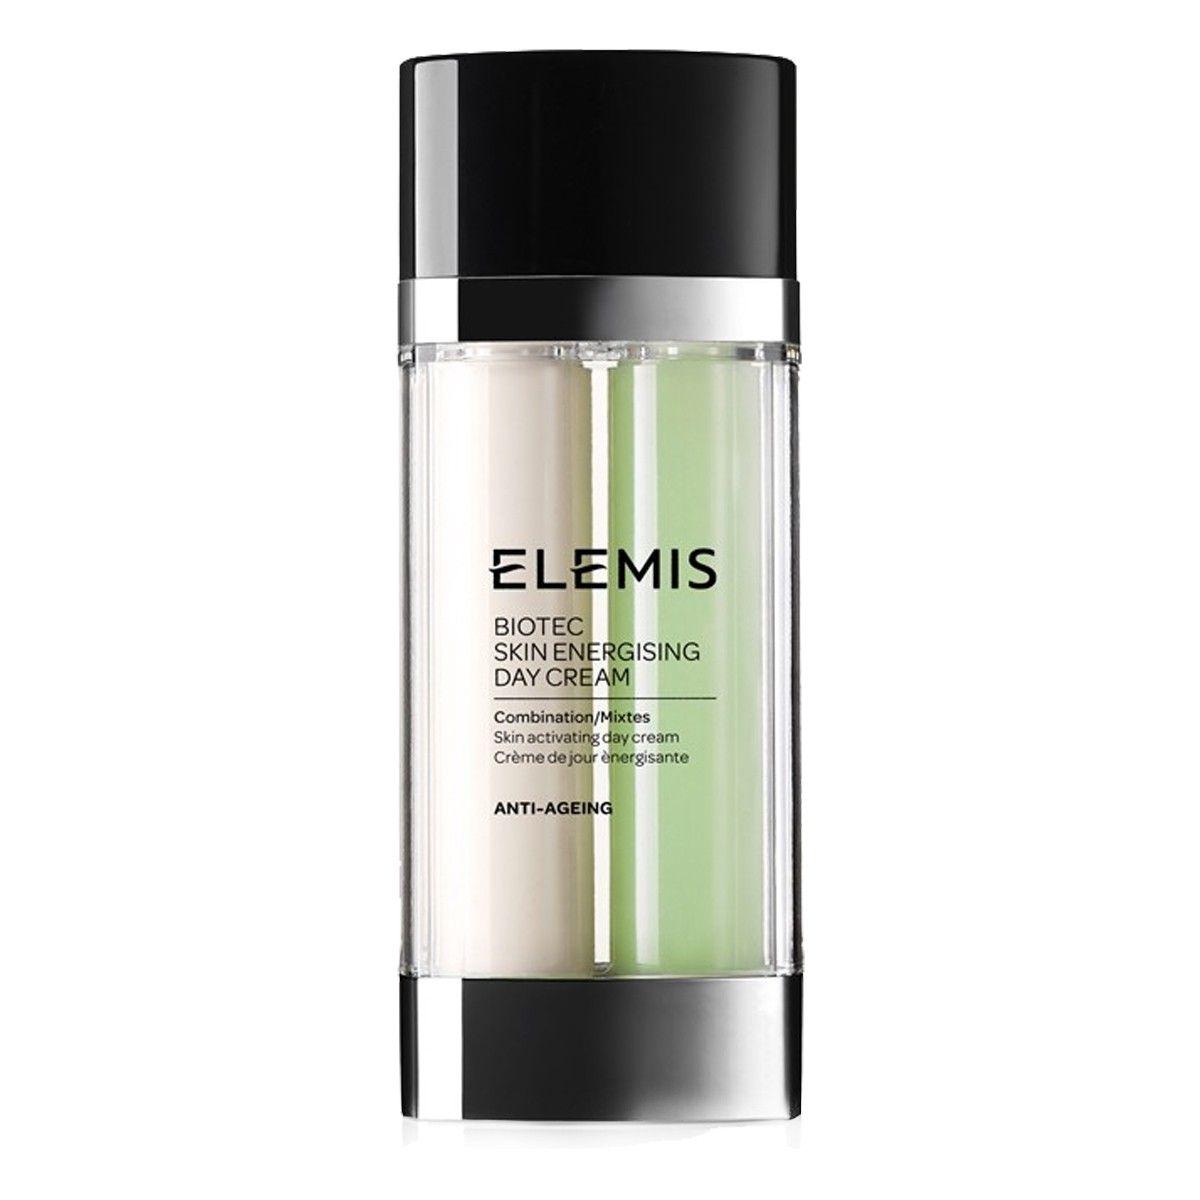 Afbeelding van Elemis BIOTEC Day Cream Combination 30Ml Beauty